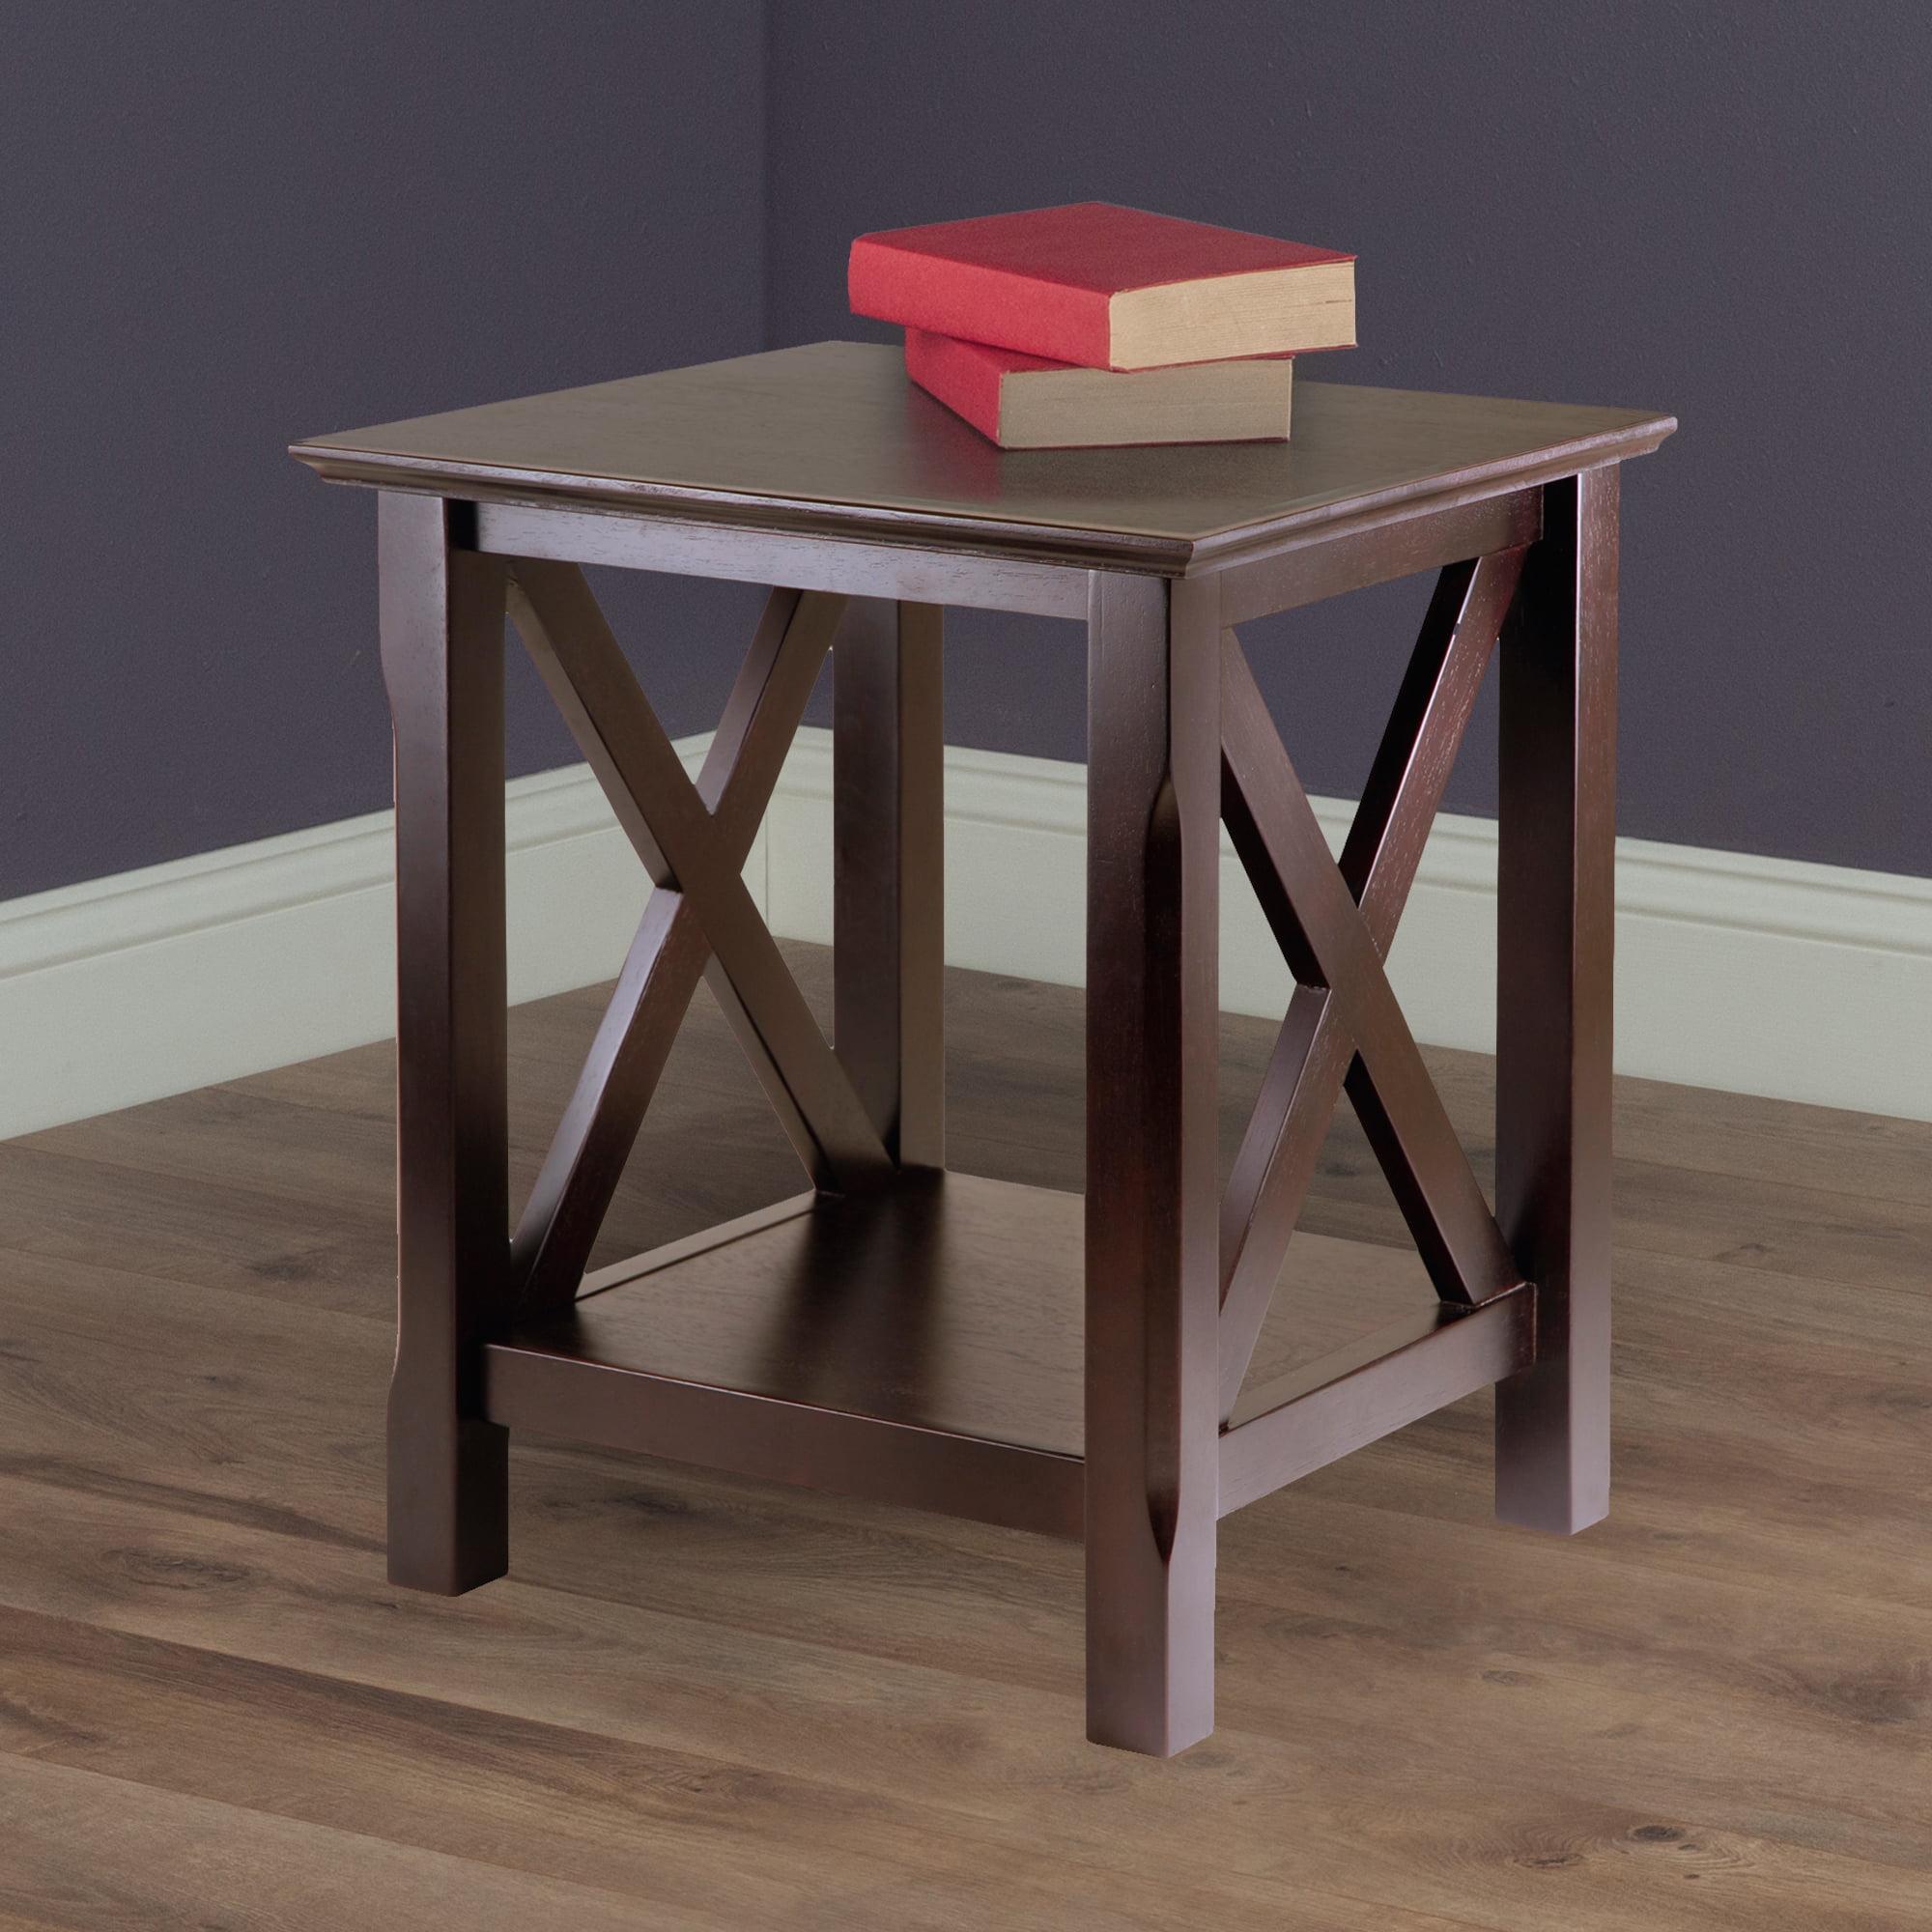 Miraculous Winsome Wood Xola X Panel End Table Cappuccino Walmart Com Spiritservingveterans Wood Chair Design Ideas Spiritservingveteransorg